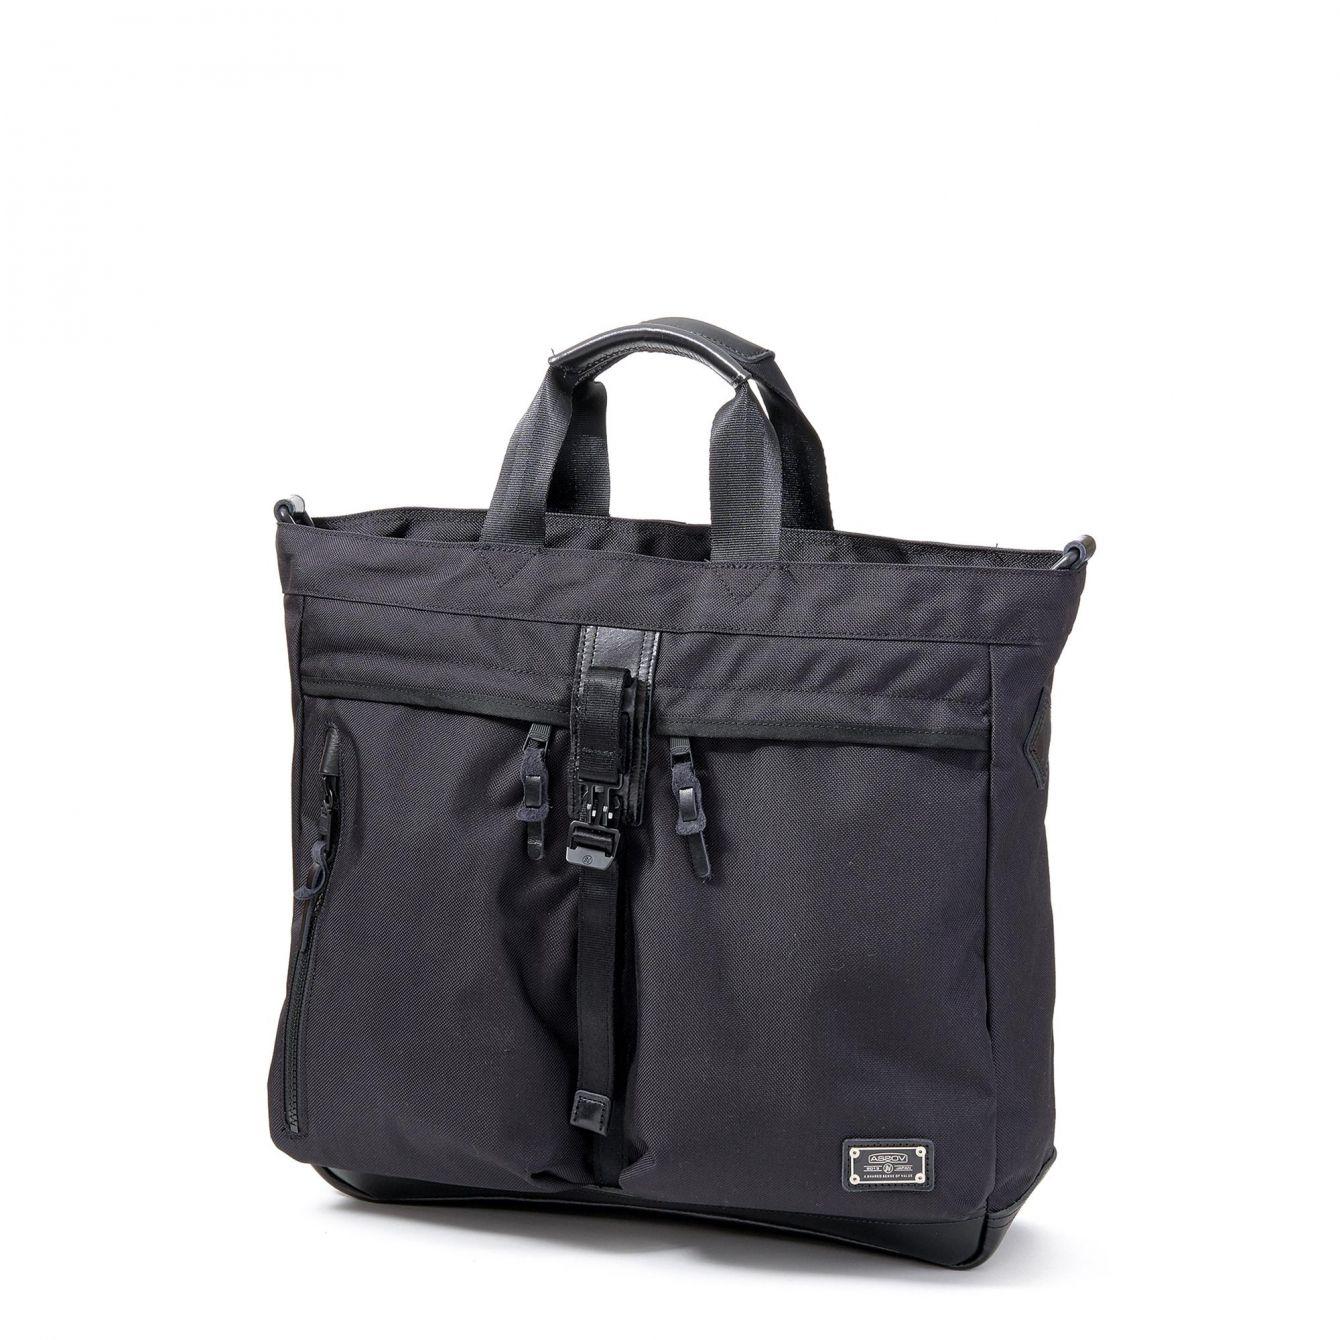 # 「AS2OV」包袋品牌獨家彈道尼龍:2WAY SHOULDER & BODY BAG 新品上市 5